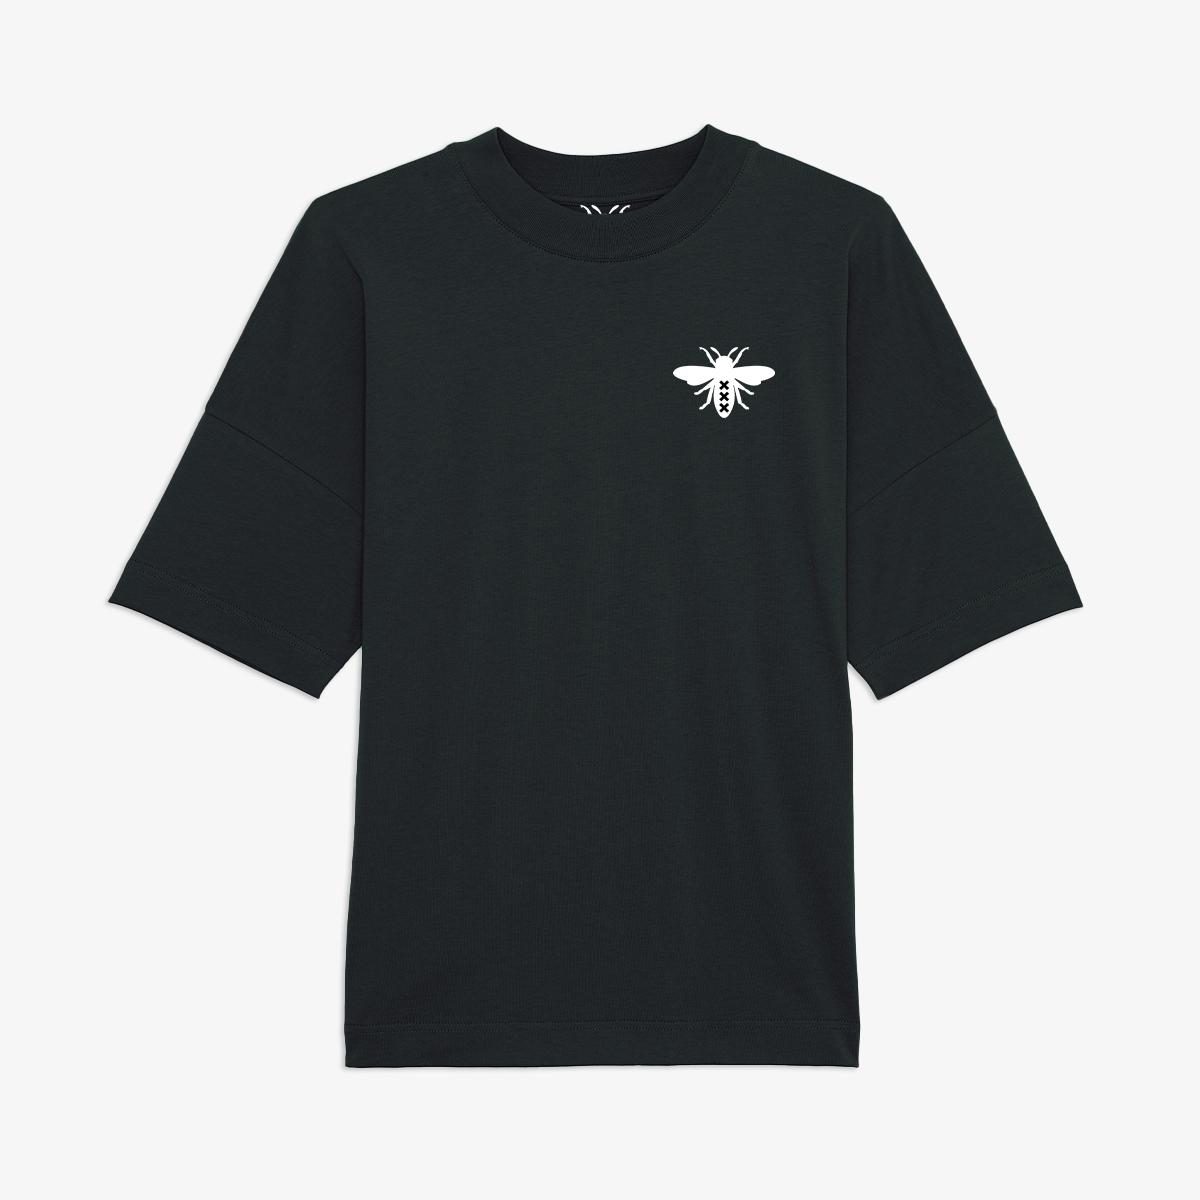 Oversized-Black-Shirt-1990-Front-1200x1200